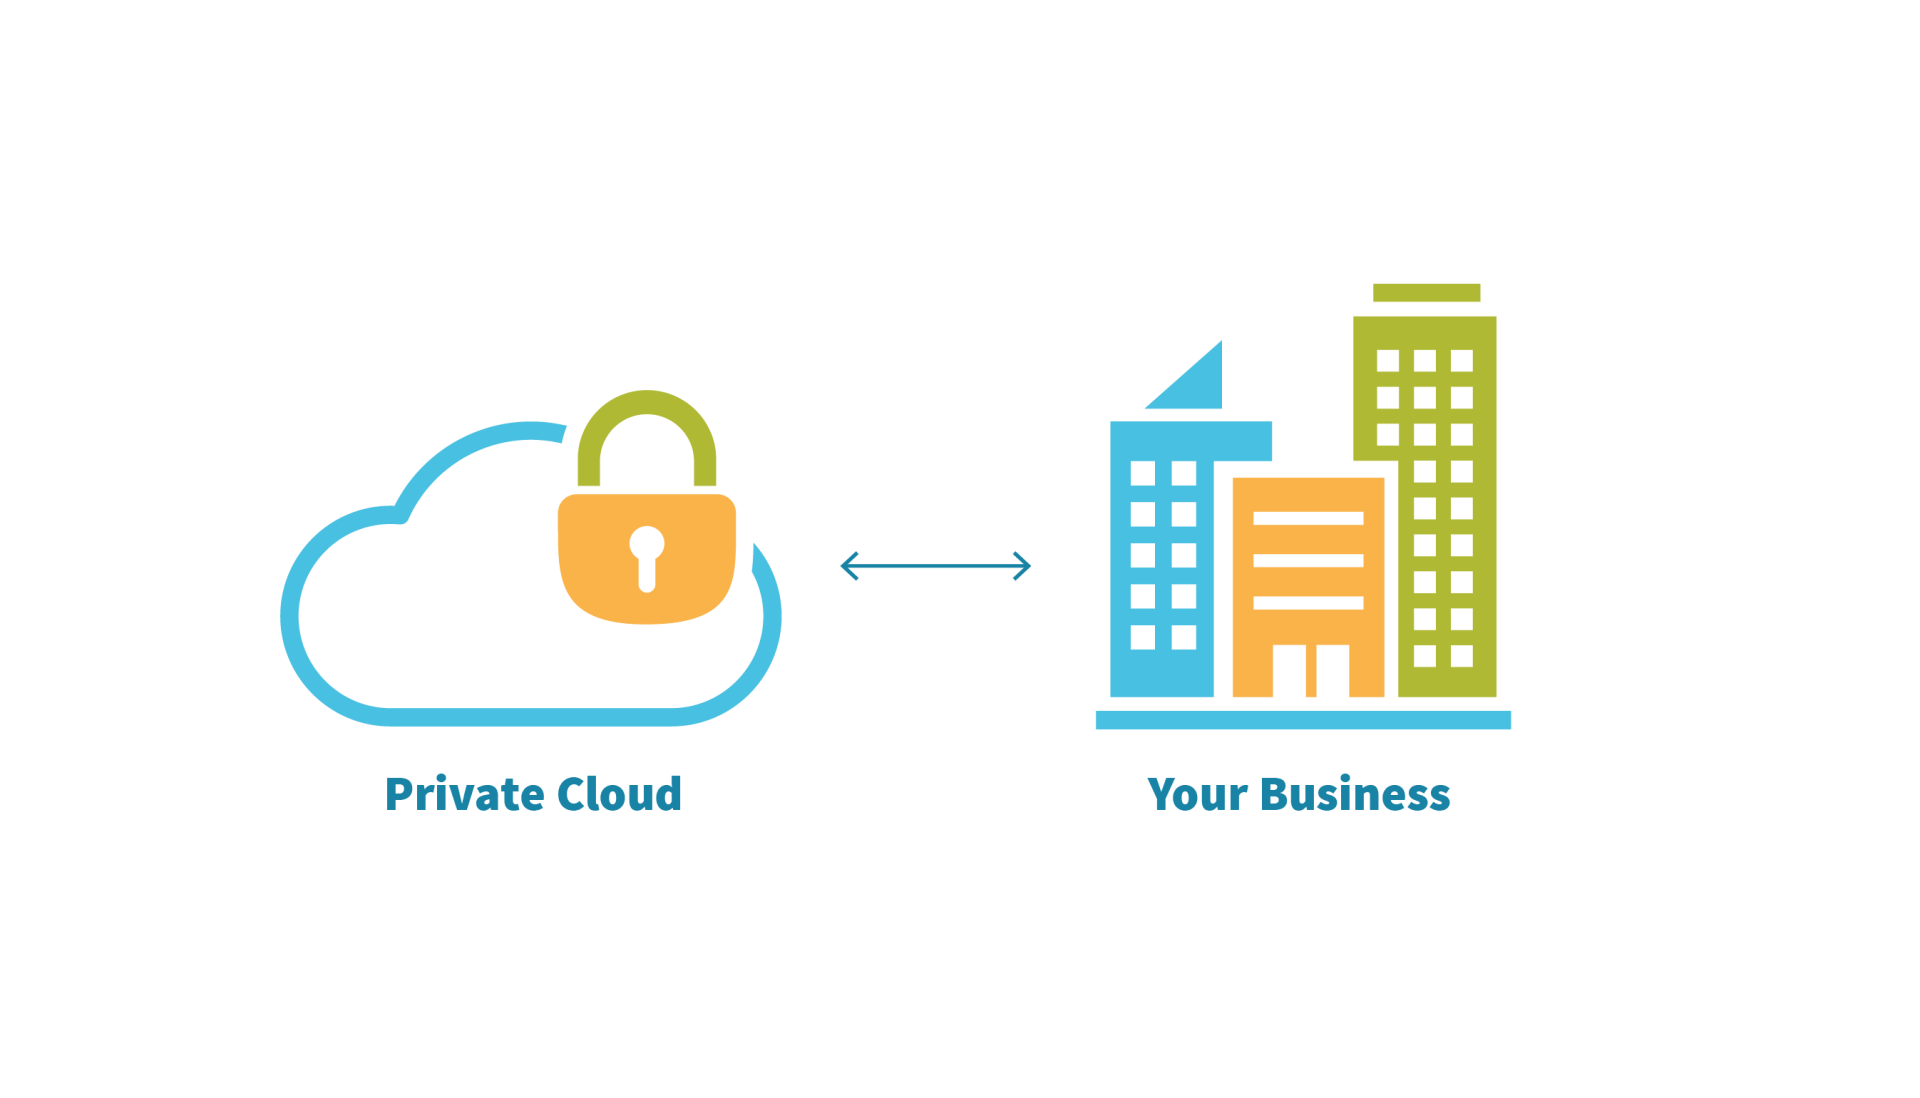 our-kloud-Cloud-Diagrams-v2-01-Private-3